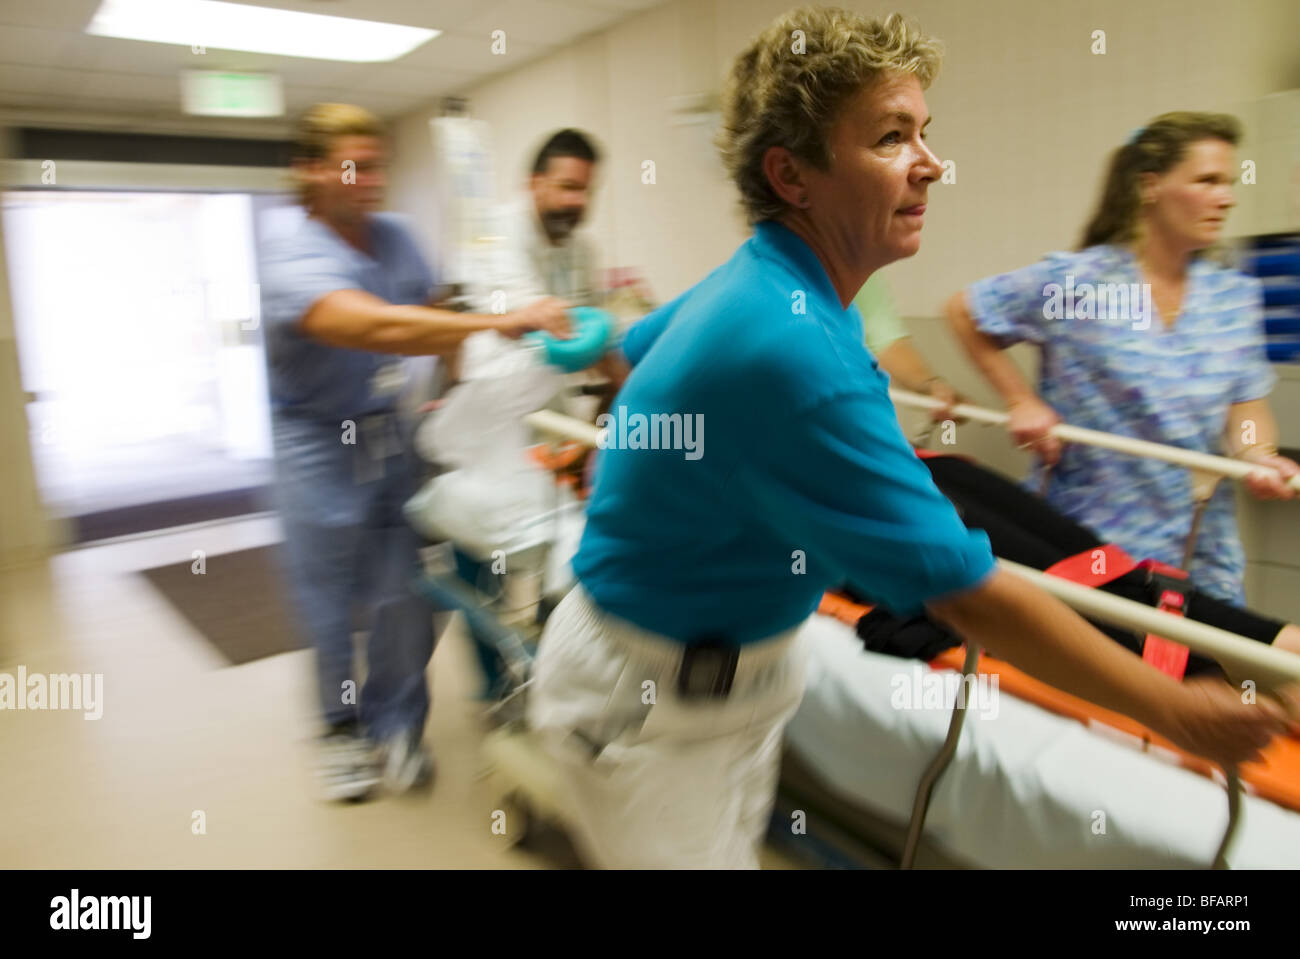 Mason General Hospital Emergency Room